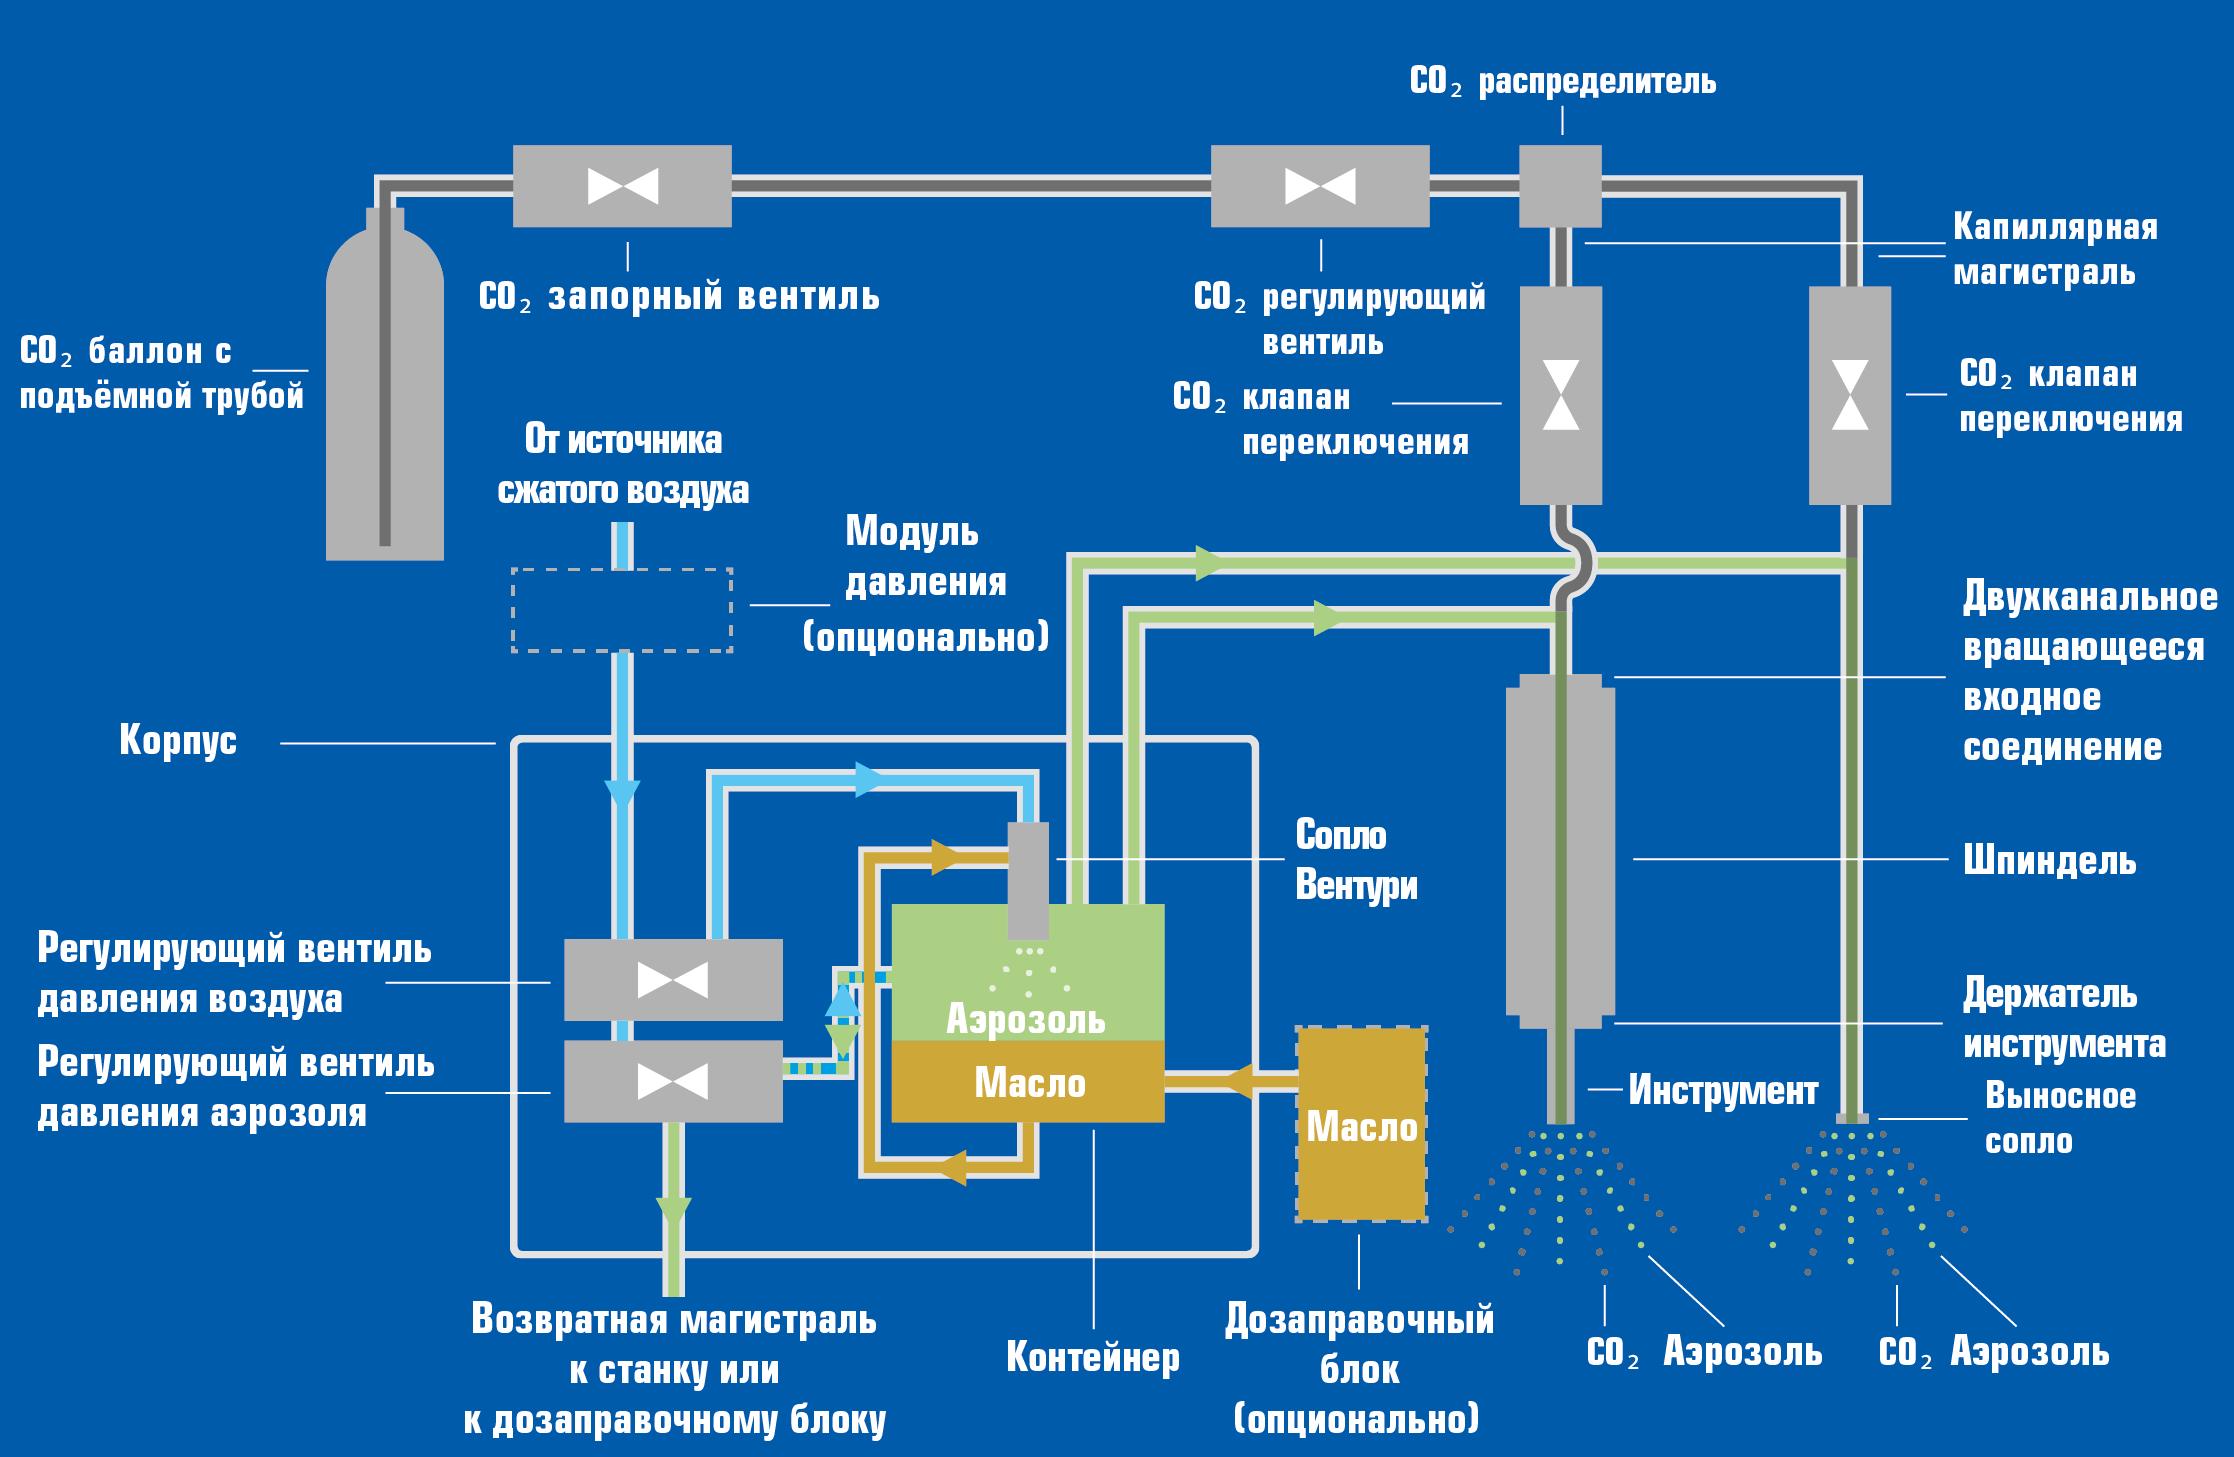 Принцип работы AerosolMaster 4000 Cryolub